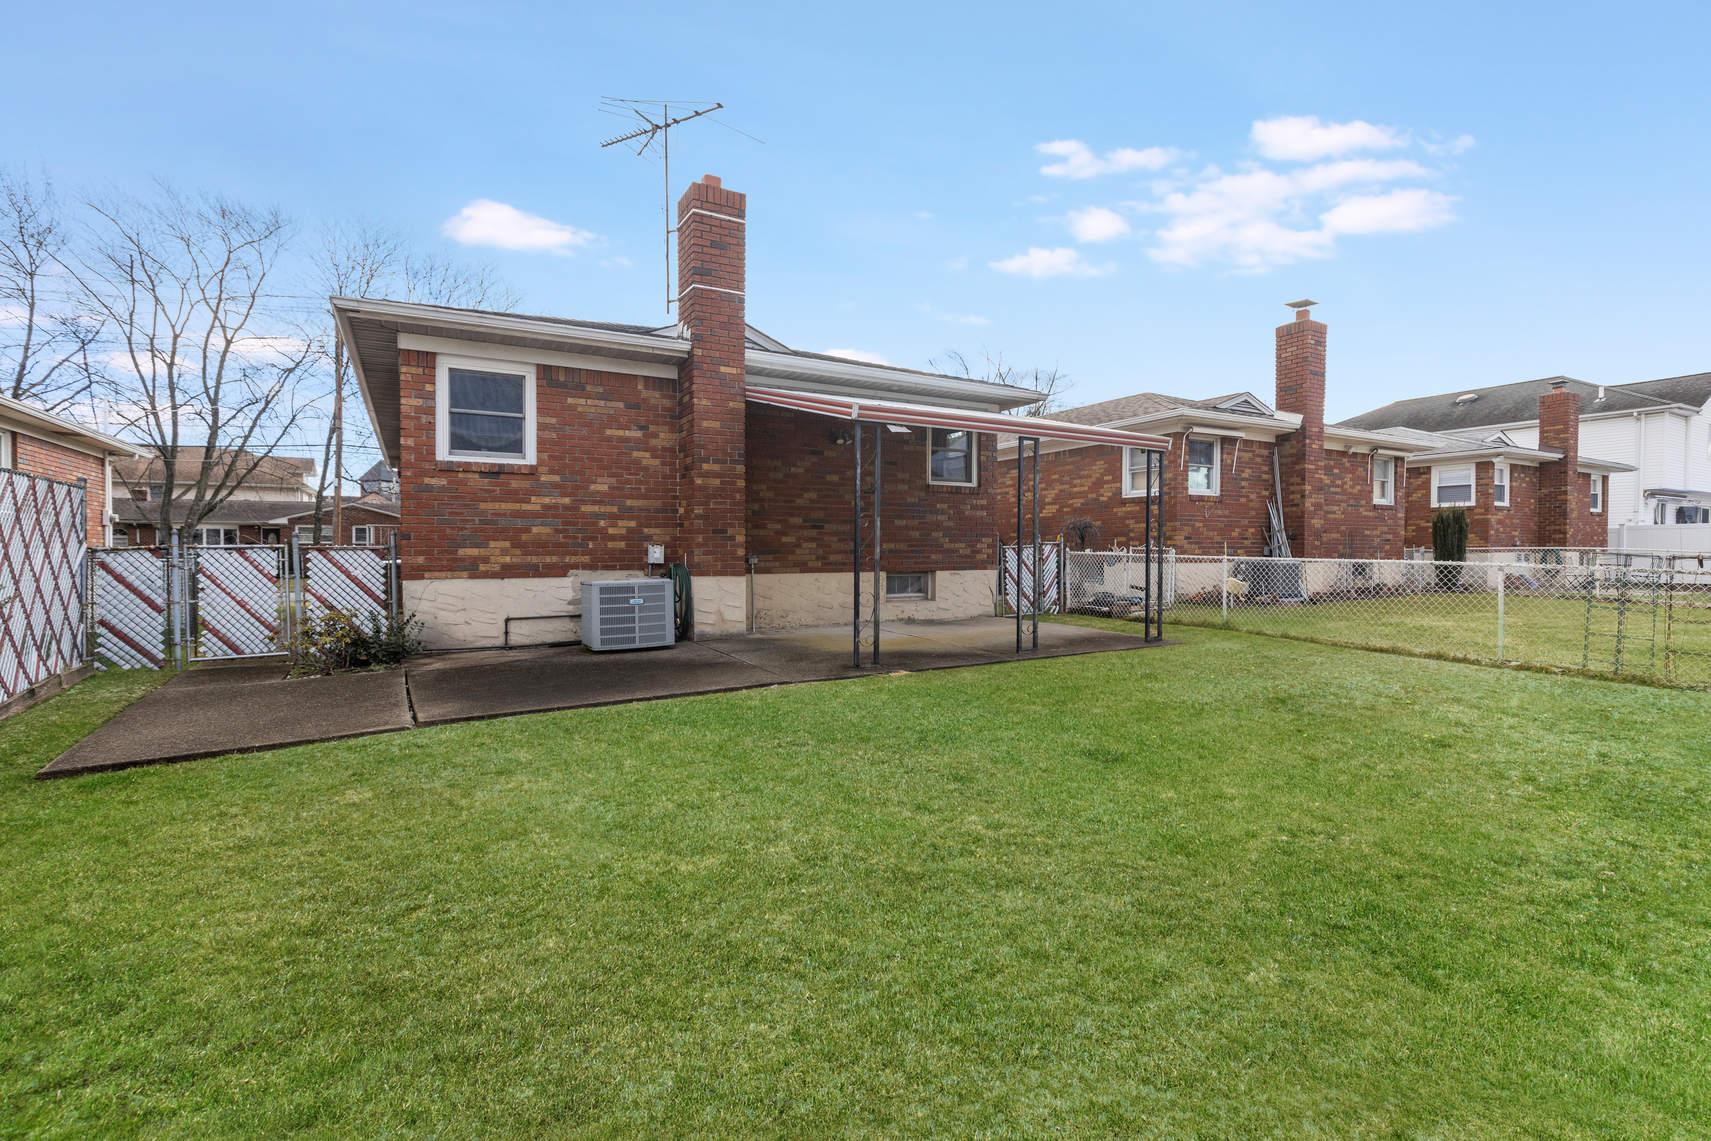 210 Collfield Ave photo